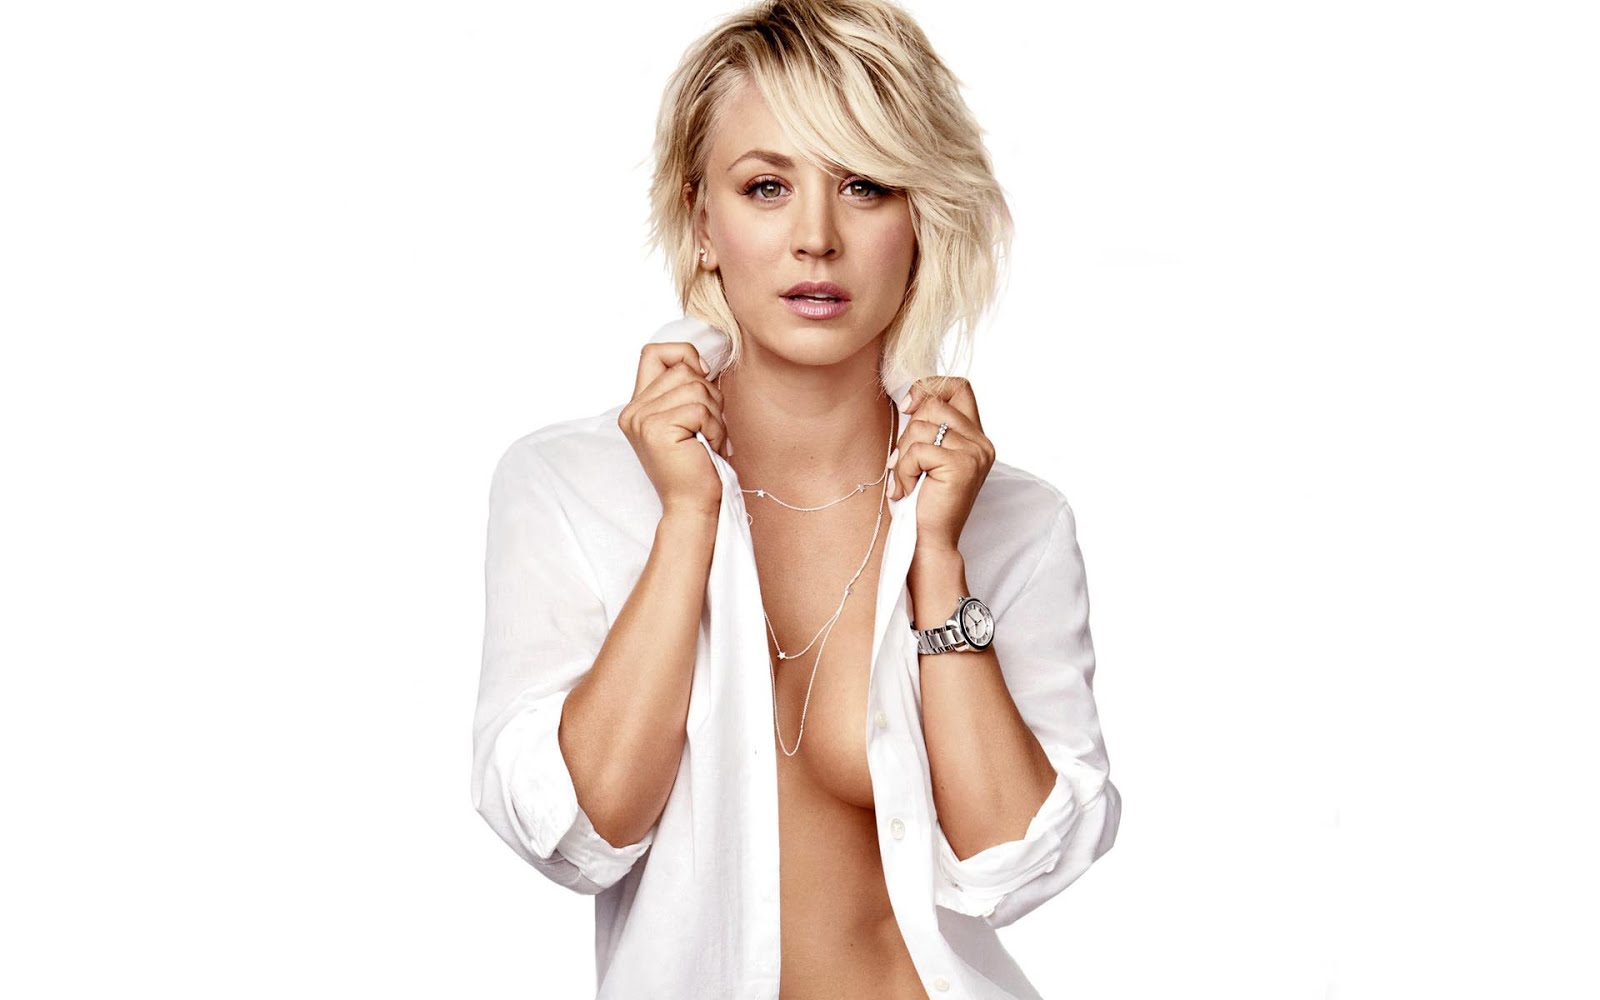 snapchat breast